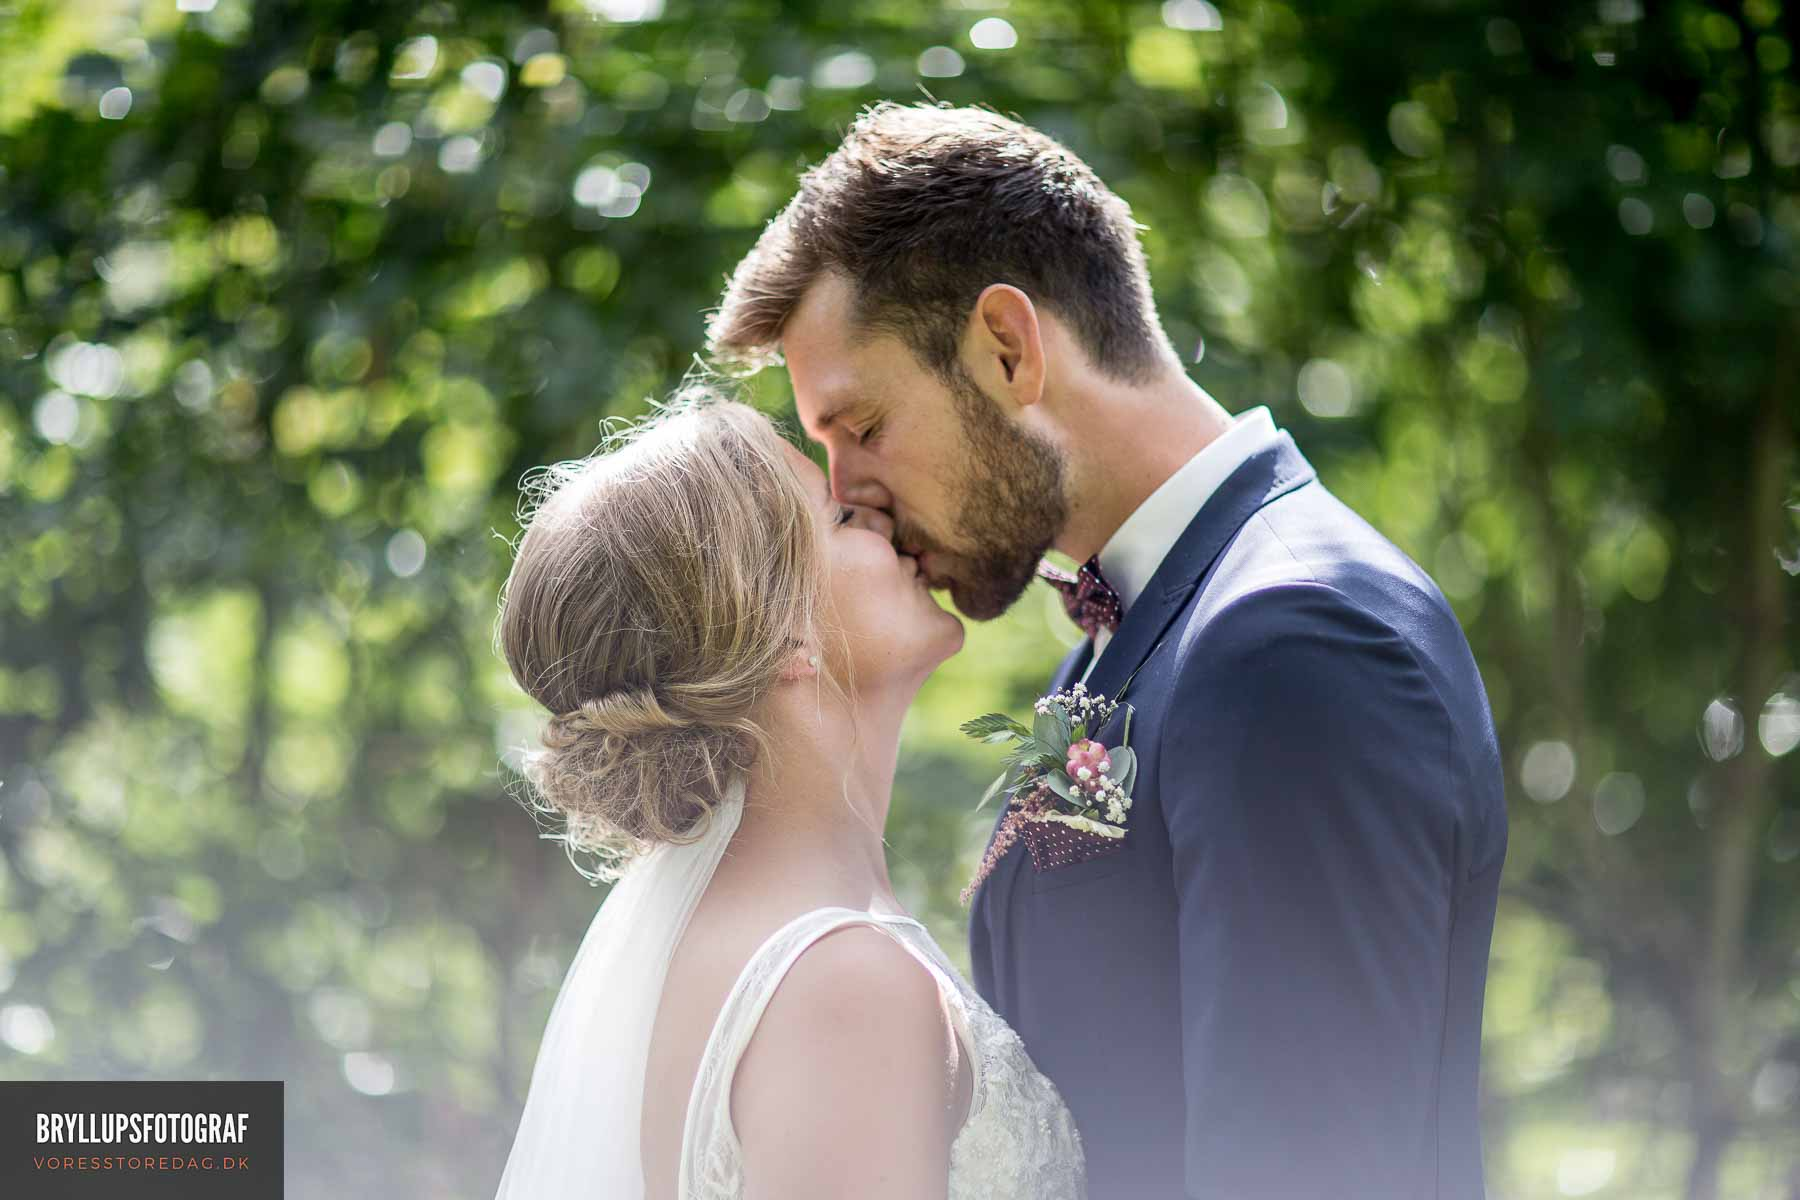 Bryllupsfotograf og fotograf til bryllup